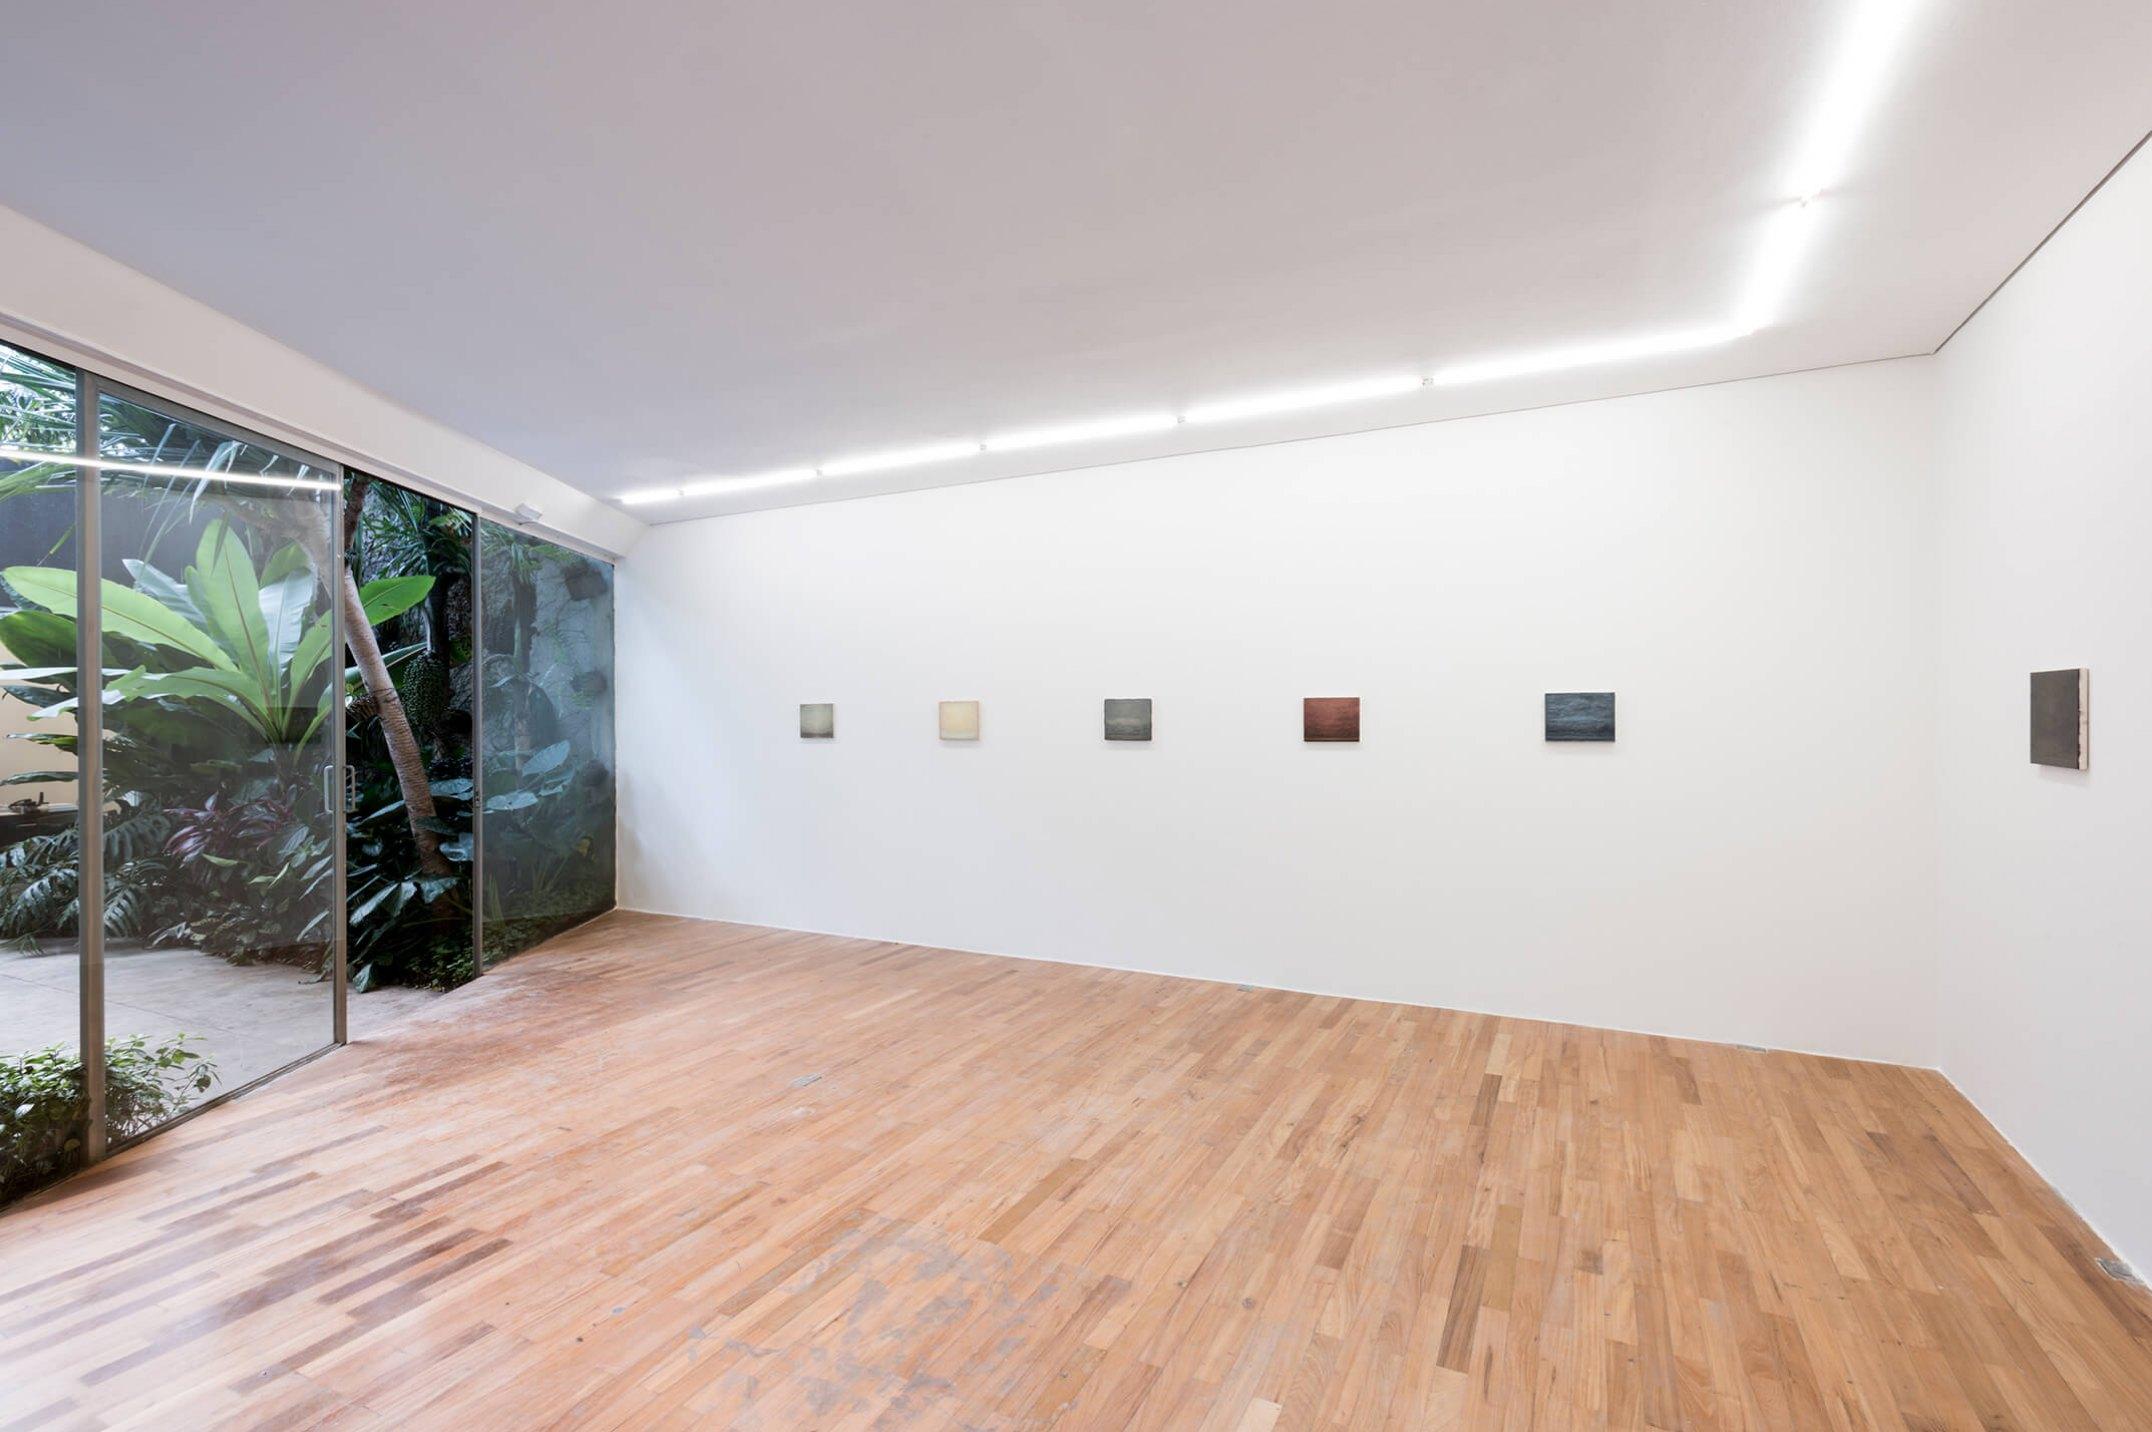 Lucas Arruda,<em>Deserto-Modelo as above so below,</em>Mendes Wood DM, São Paulo, 2016 - Mendes Wood DM